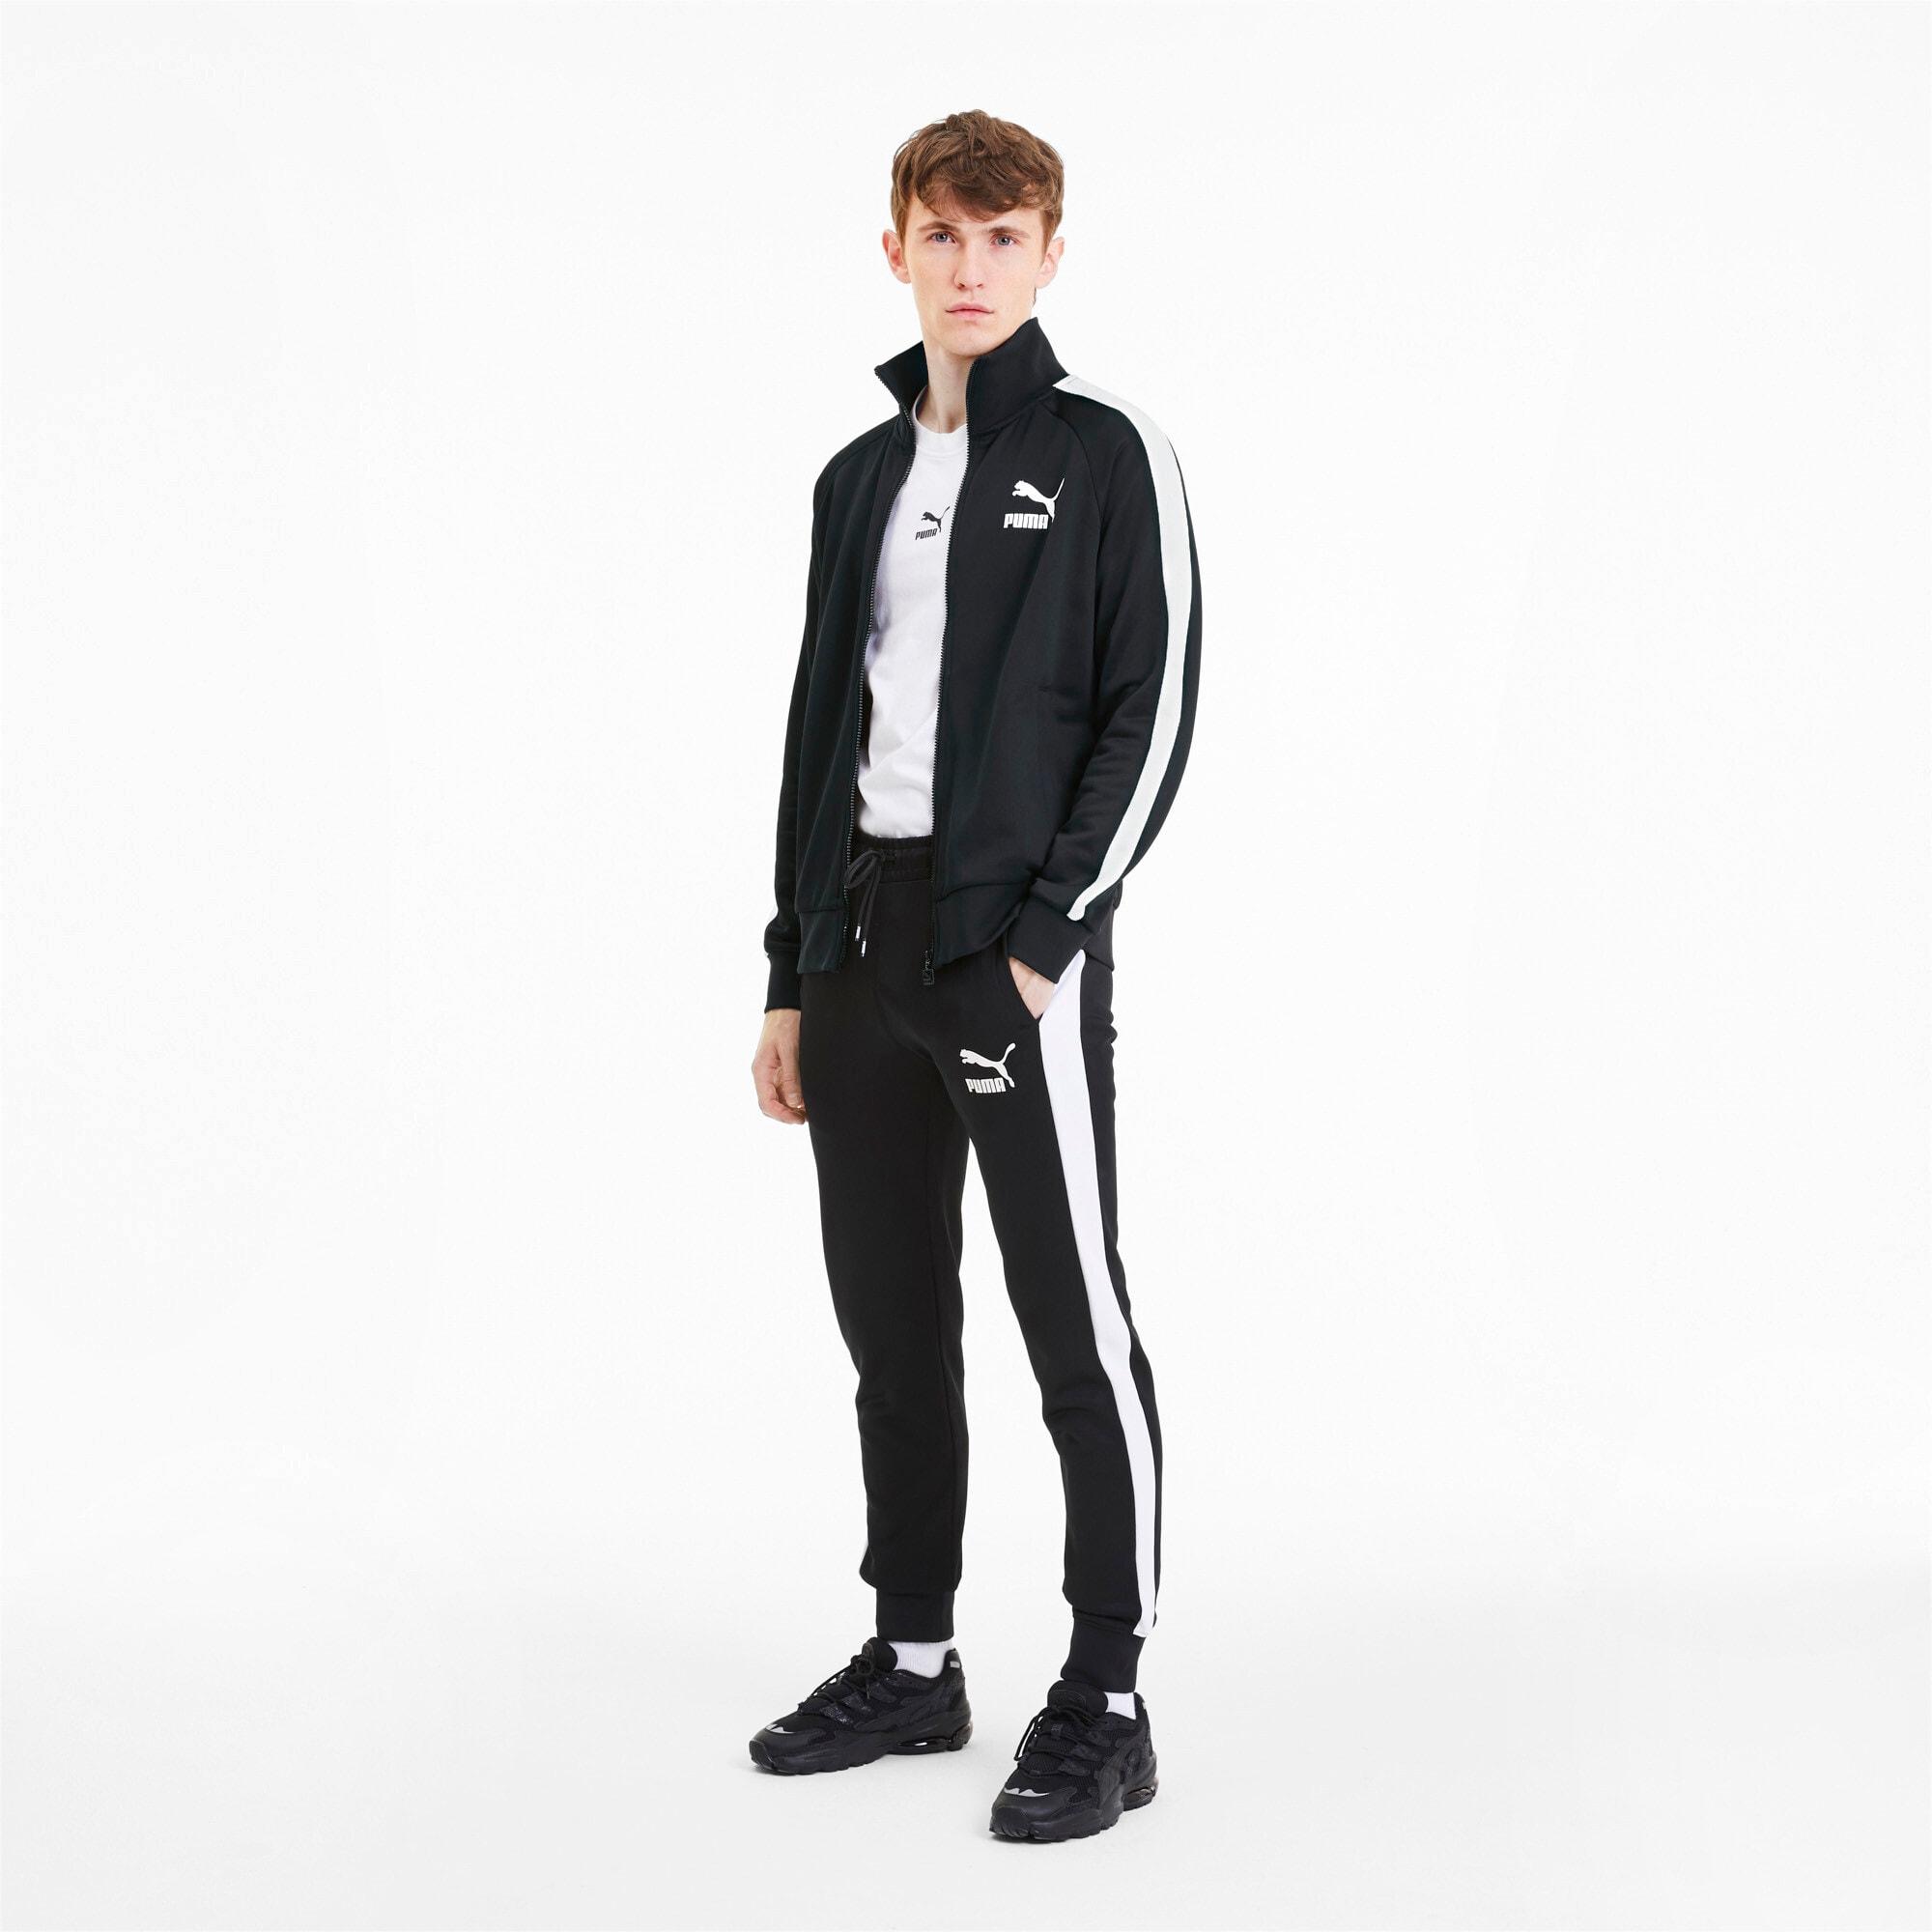 Thumbnail 3 of Iconic T7 Men's Track Jacket, Puma Black, medium